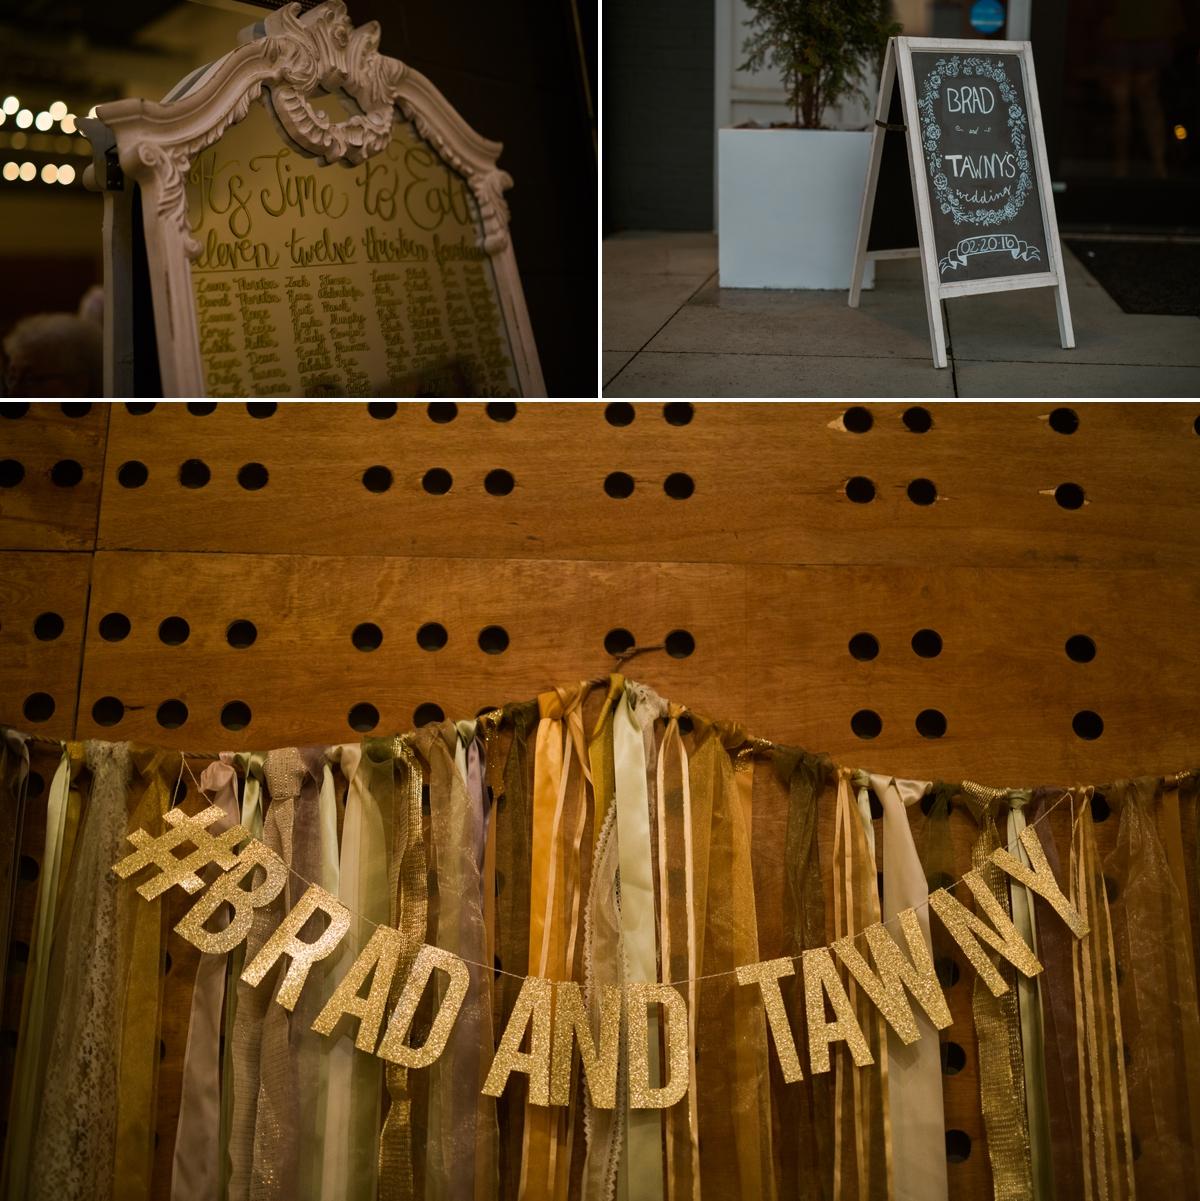 brad and tawny 1.jpg